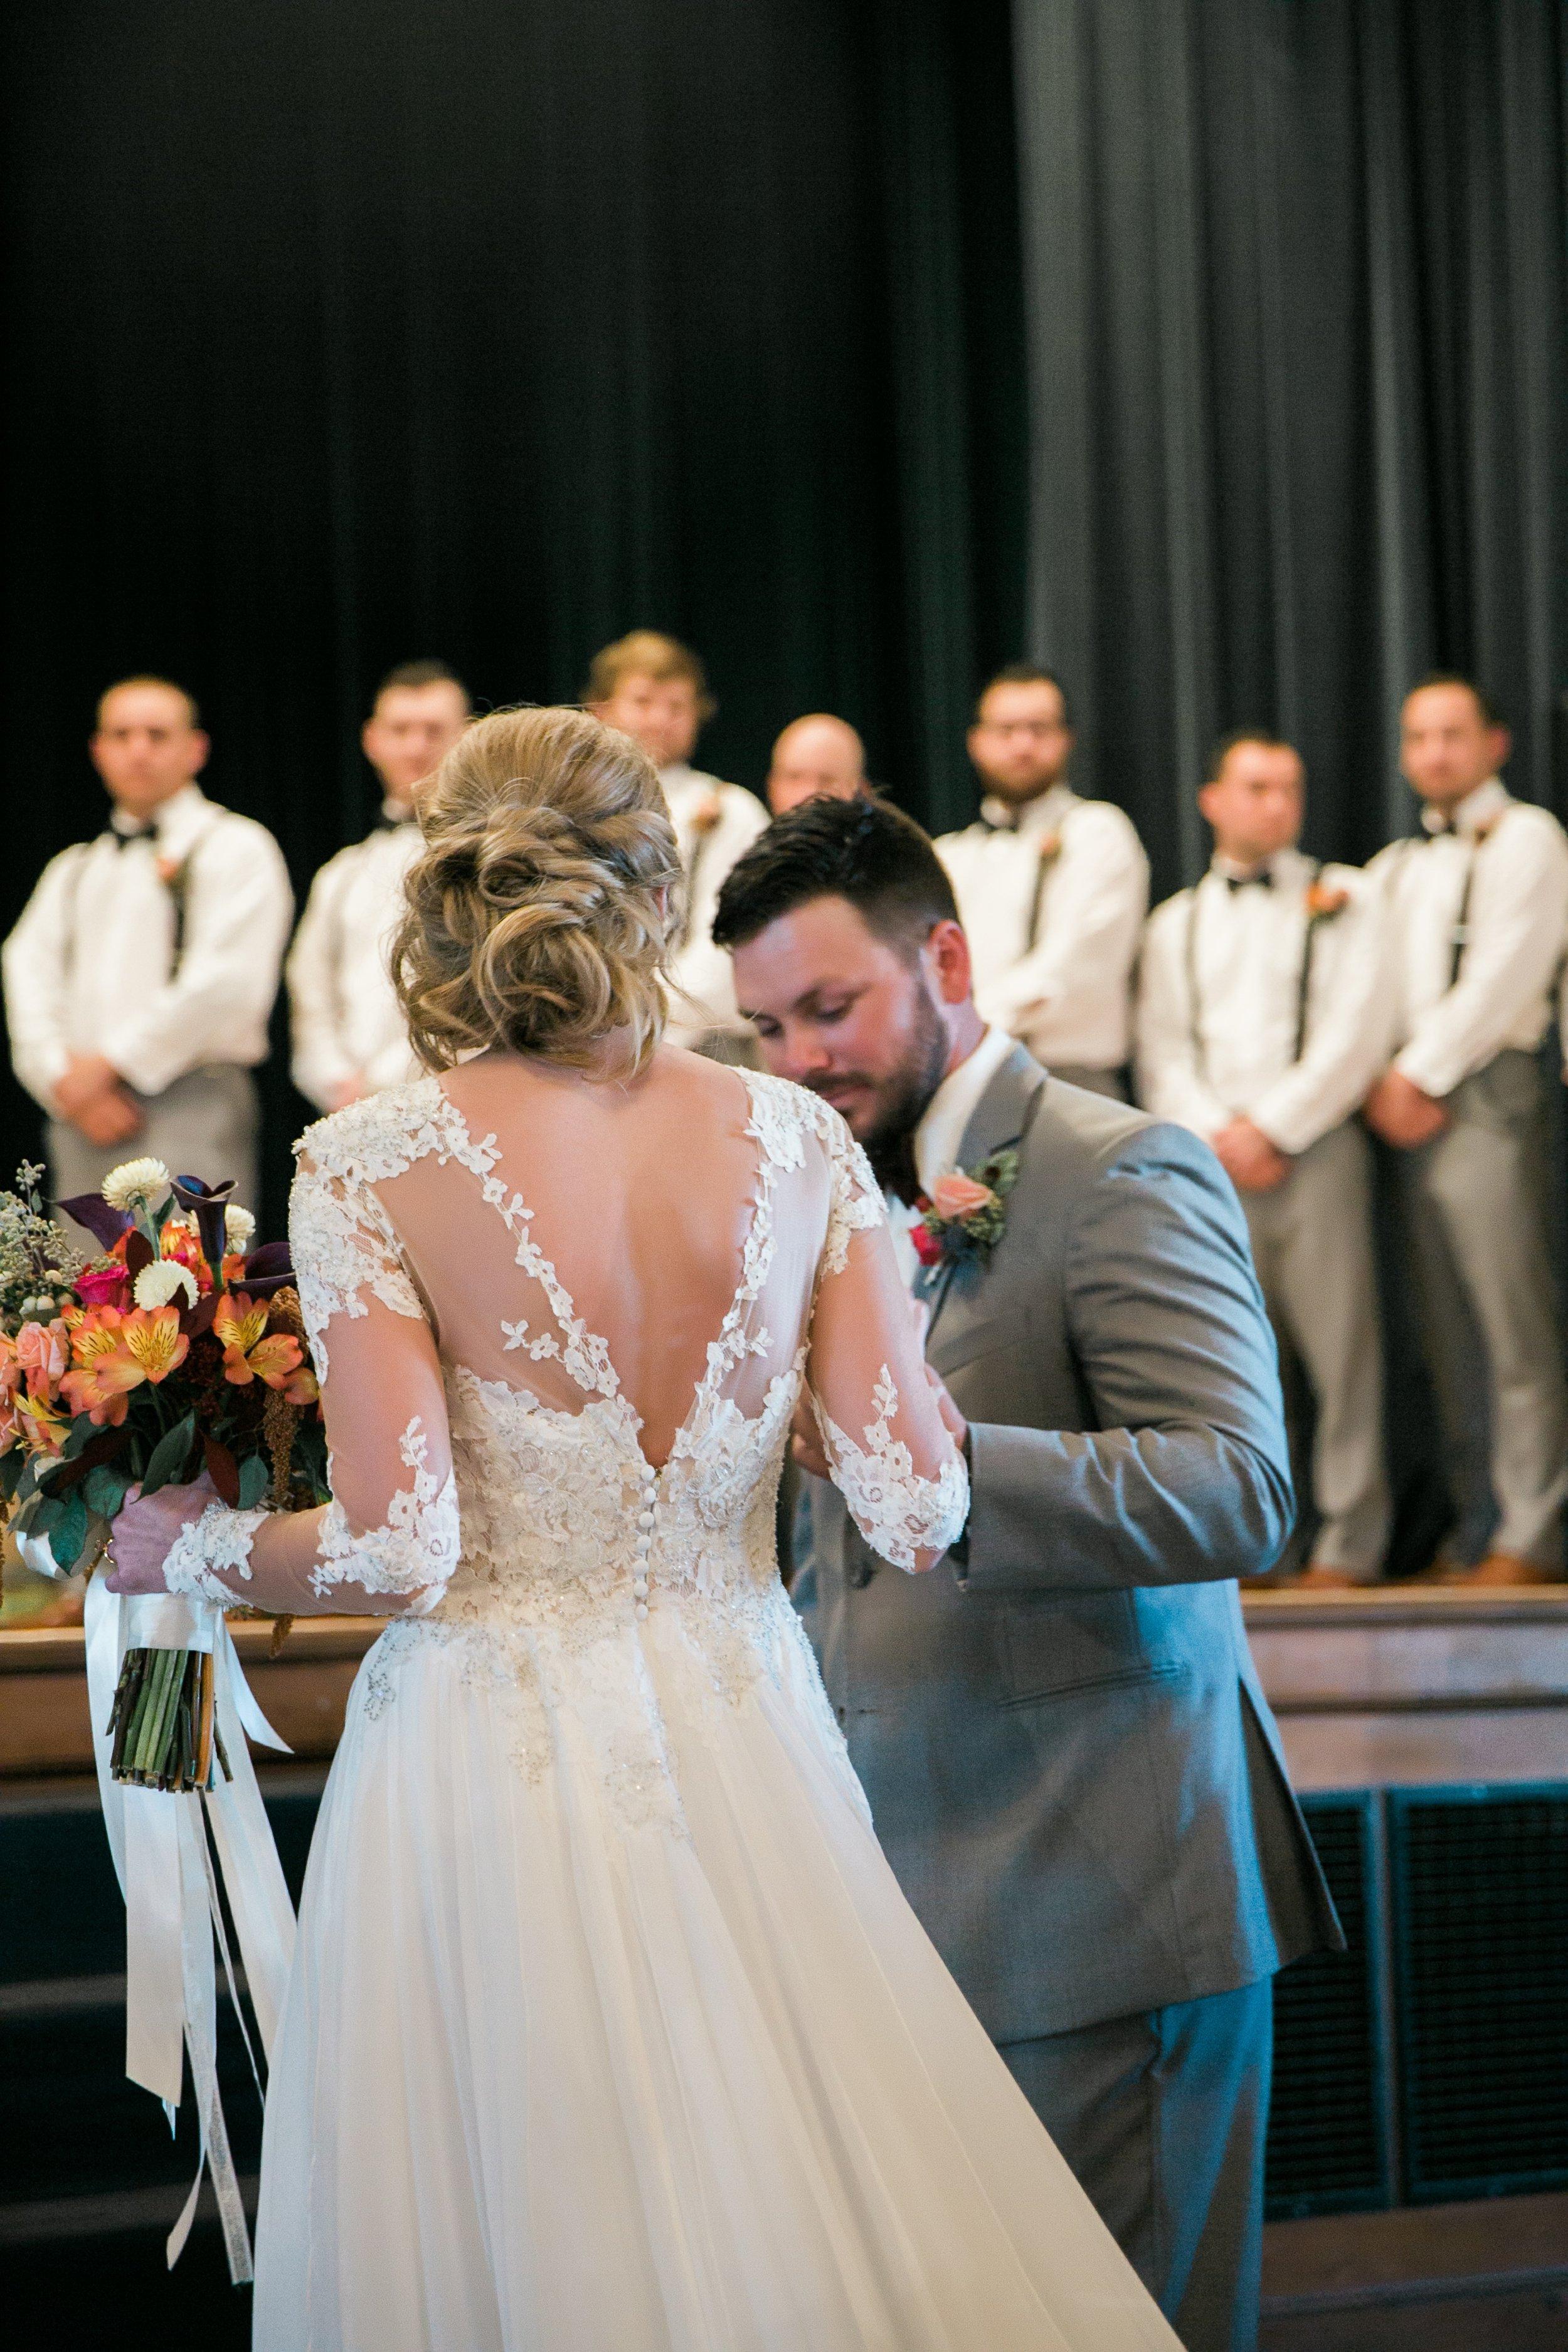 Roberson-Wedding-The-Forum-Lauren-Pinson-Wedding-Photography-Wichita-Falls-Texas-074.jpg